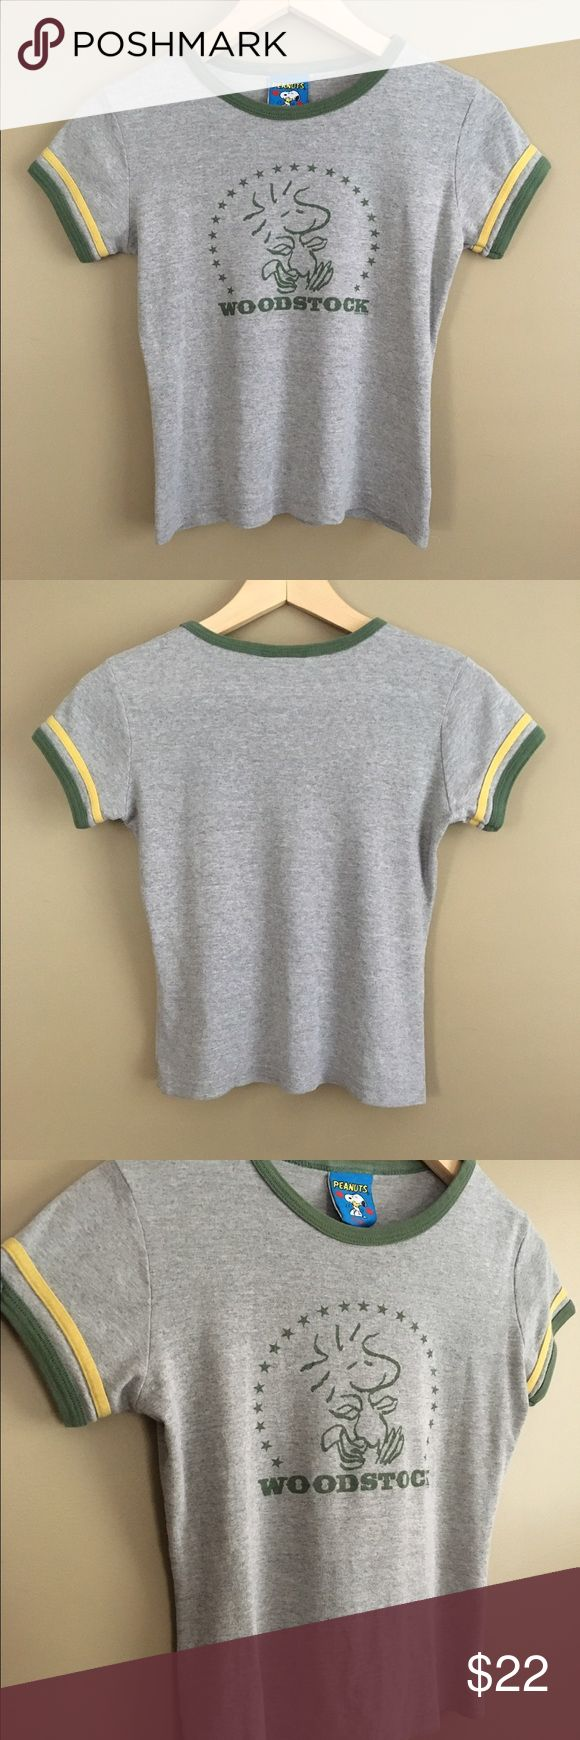 "Vintage 90s Woodstock Ringer Tee Vintage 90s Woodstock Peanuts brand ringer tee. Size youth Medium. 100% cotton. Laid flat: length: 19"" shoulders: 13.5"" chest: 15.75"" Peanuts Tops Tees - Short Sleeve"